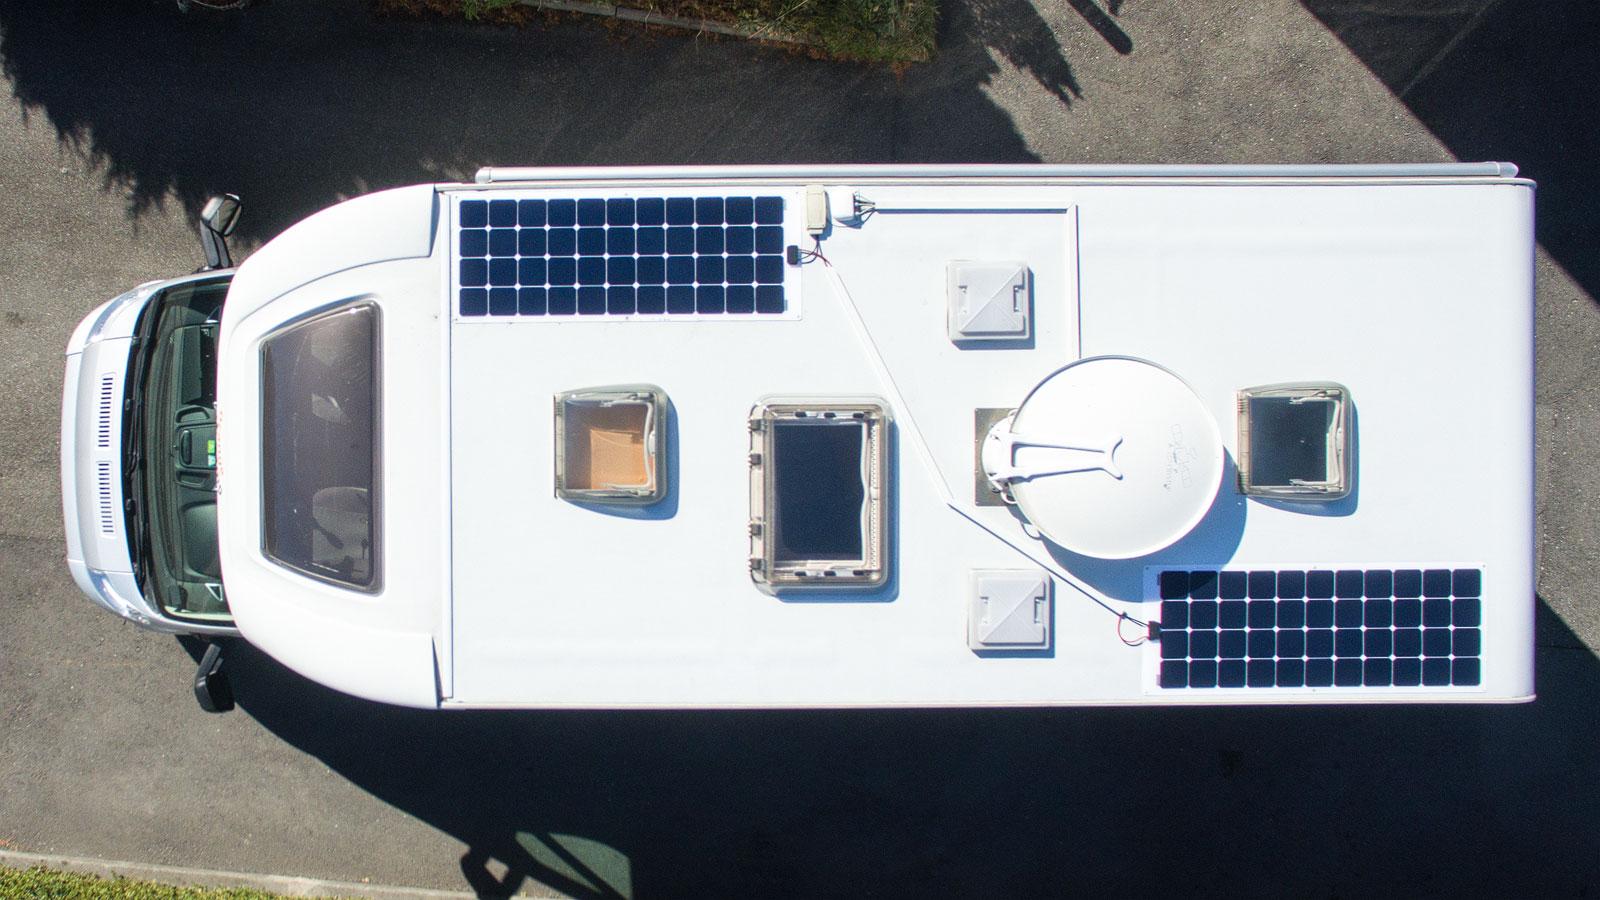 Kabel fr Solaranlage im Carado Orangecamp verlegen